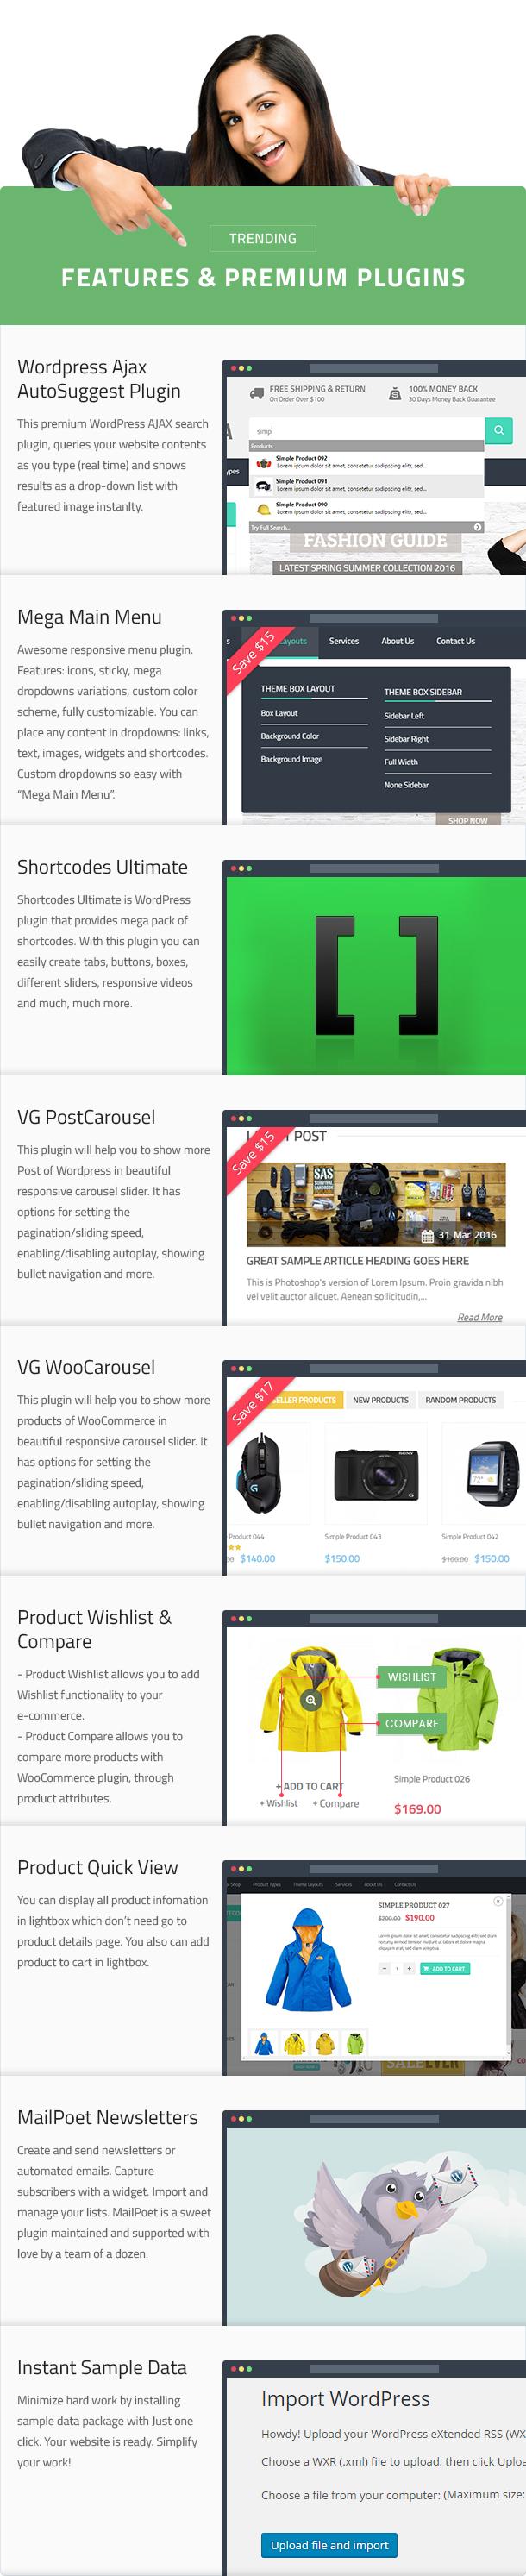 VG Sagitta - Mega Store Responsive WordPress Theme - 17